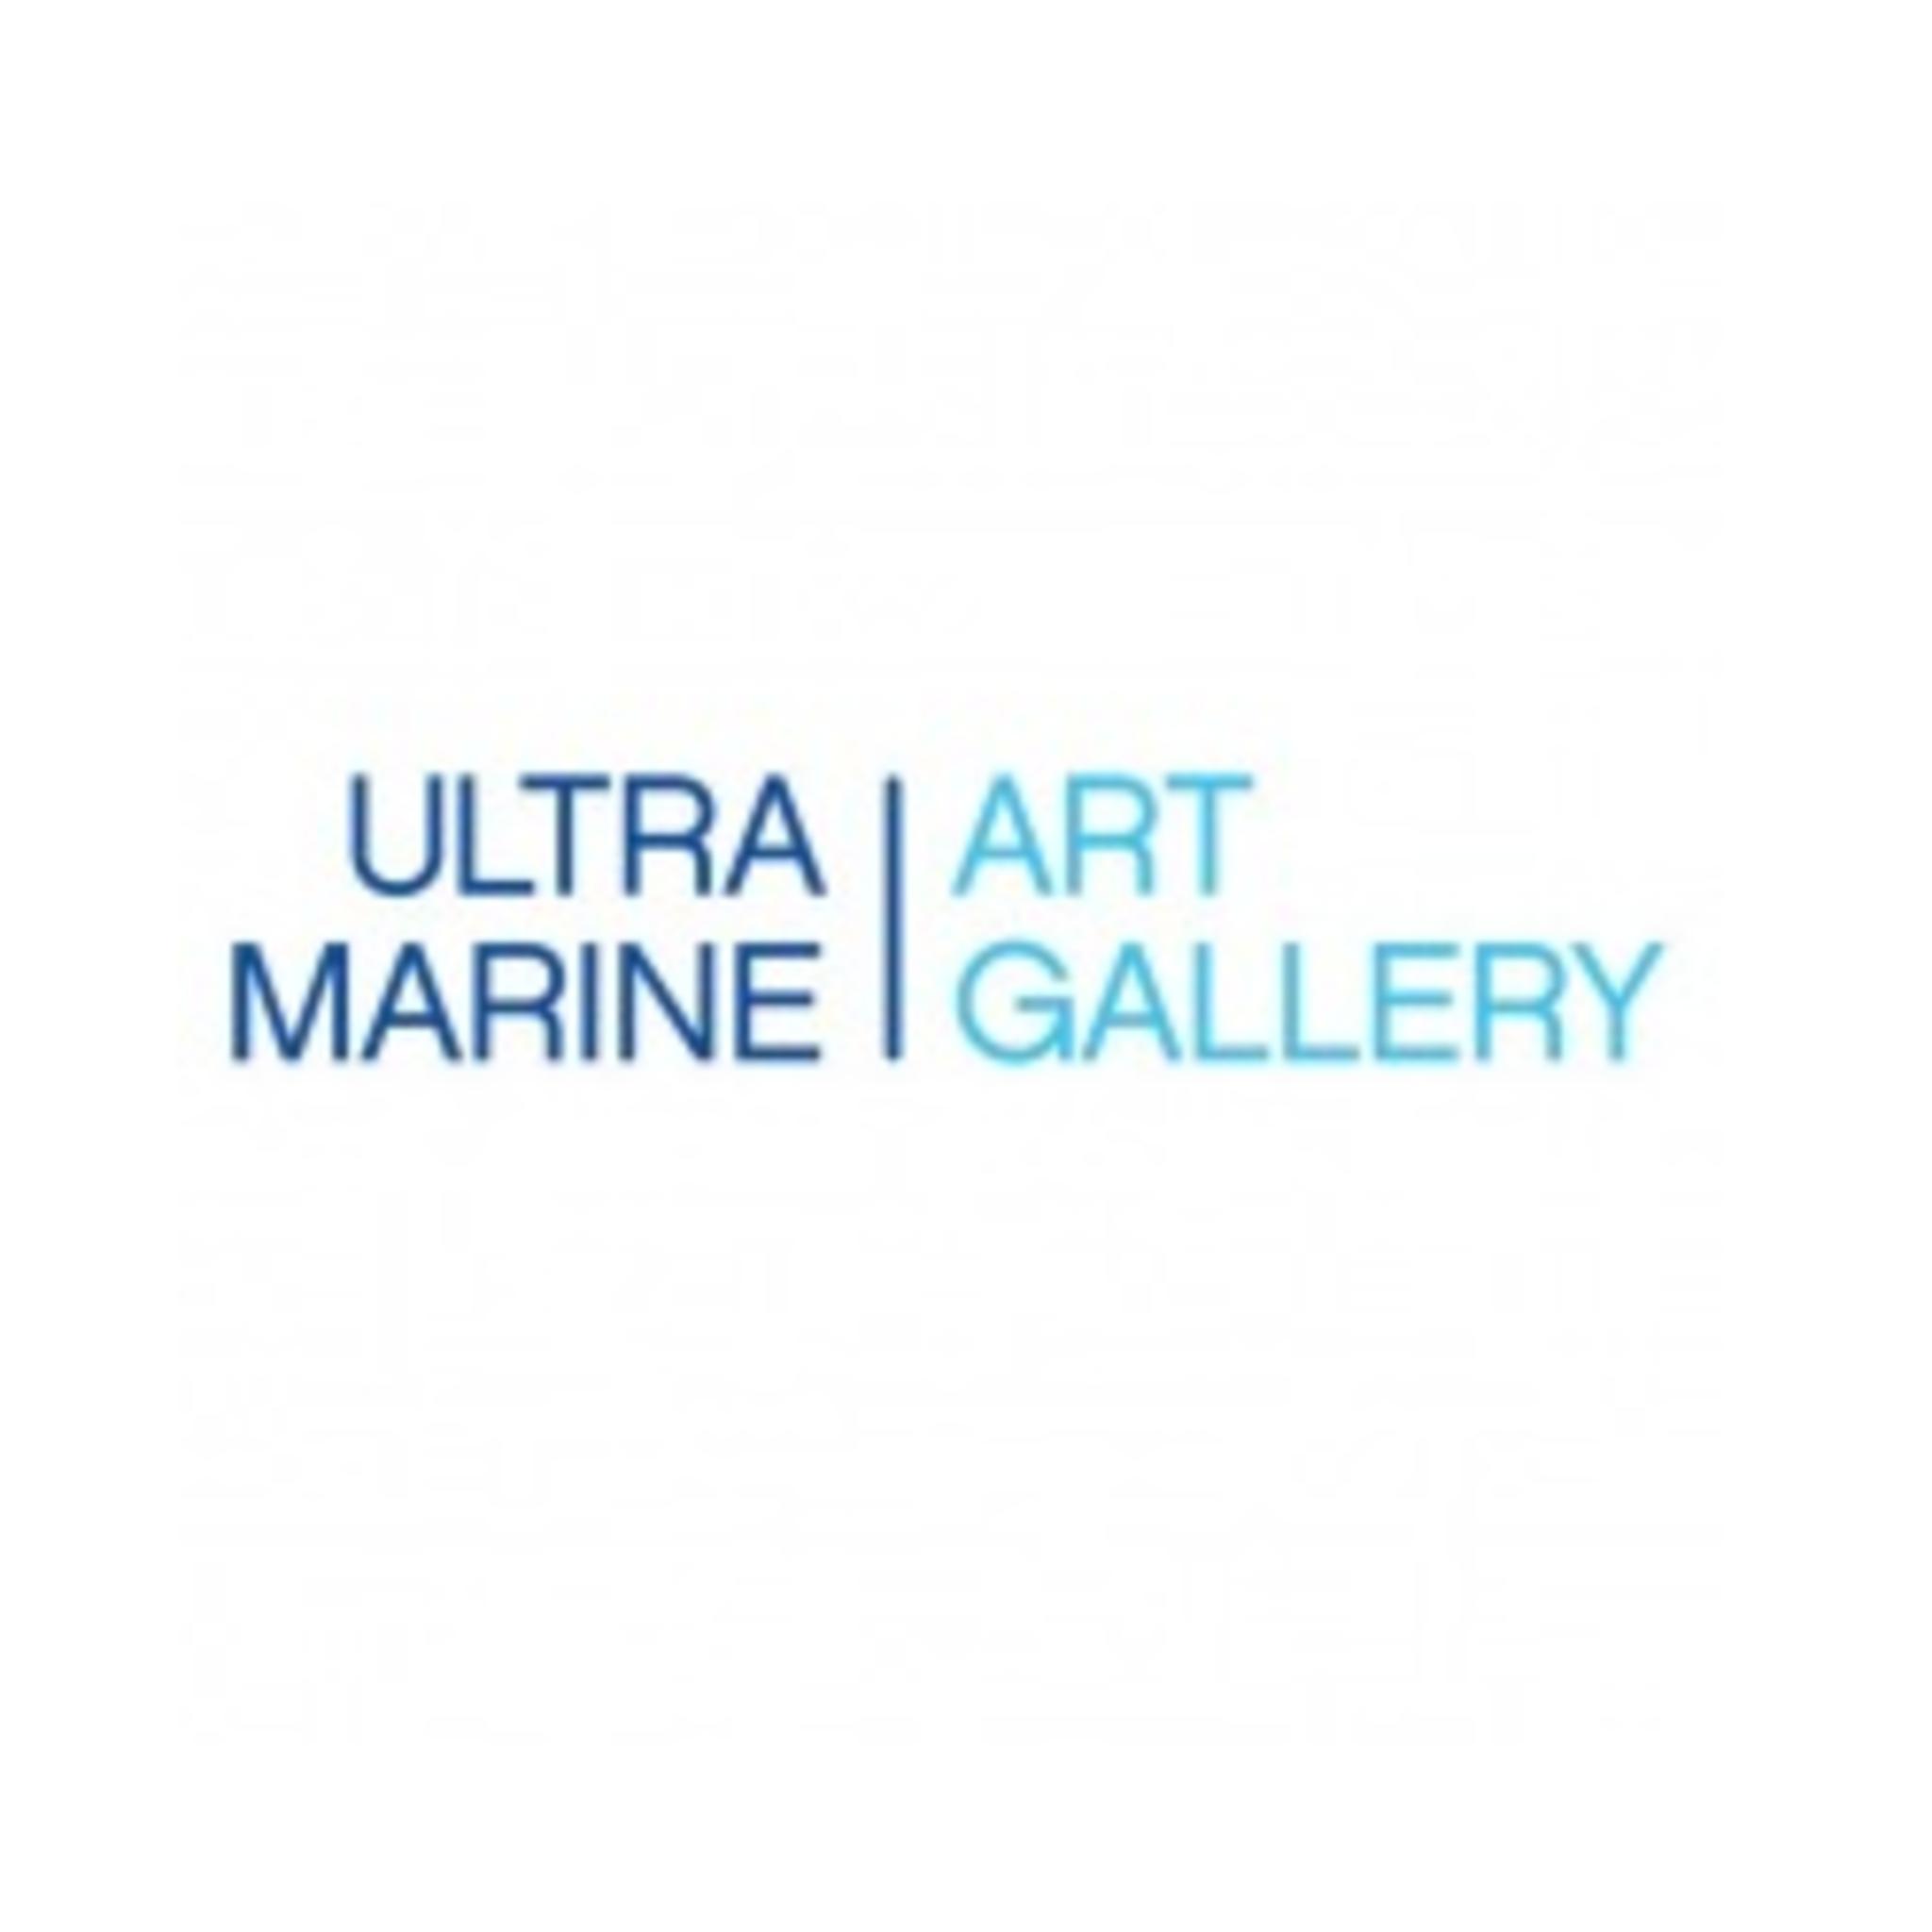 Gallery UltraMarine